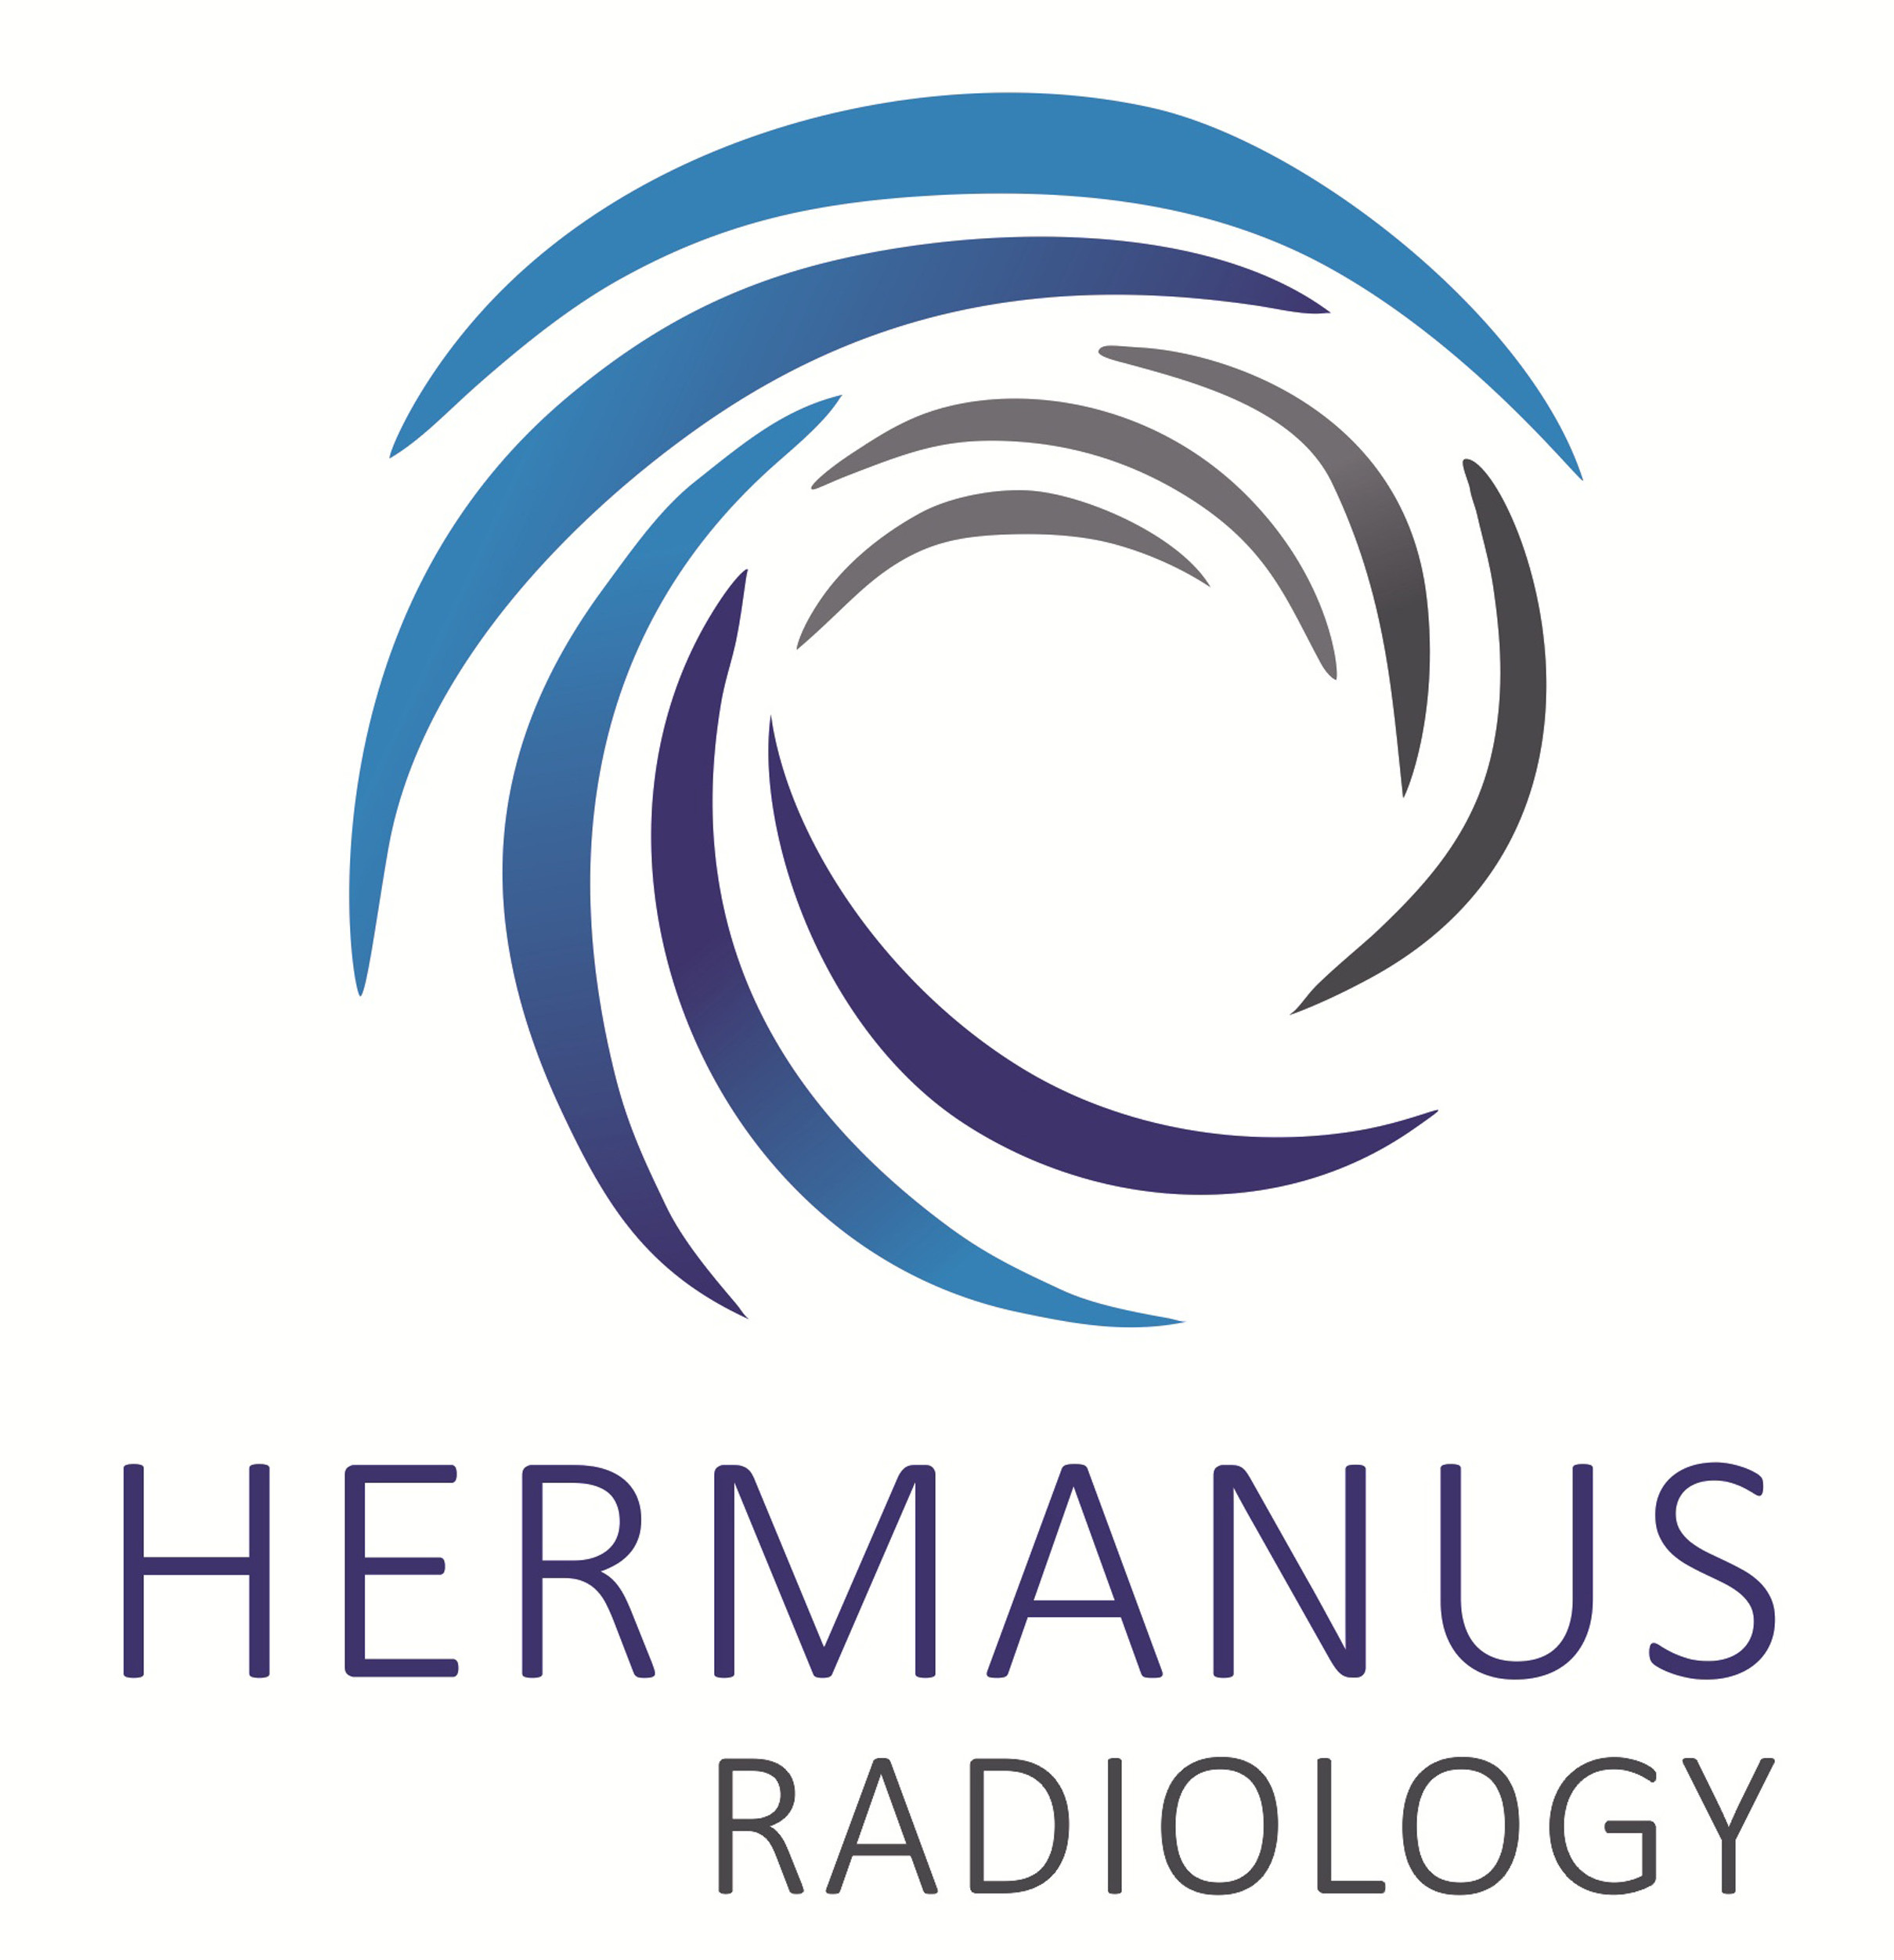 Hermanus Radiology